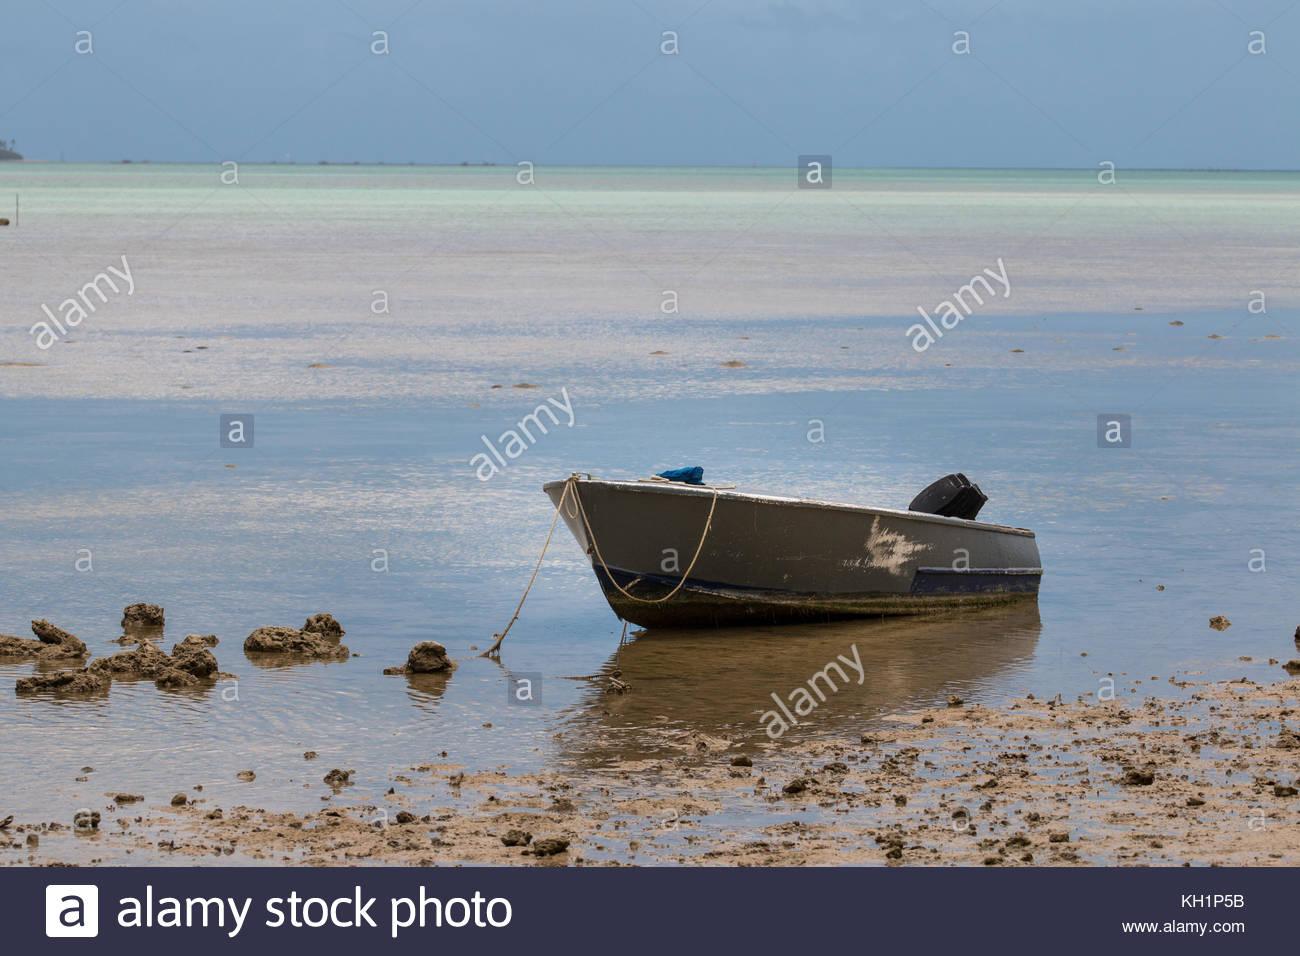 Old wooden boat on shallow water, Tongatapu Island, Tonga - Stock Image